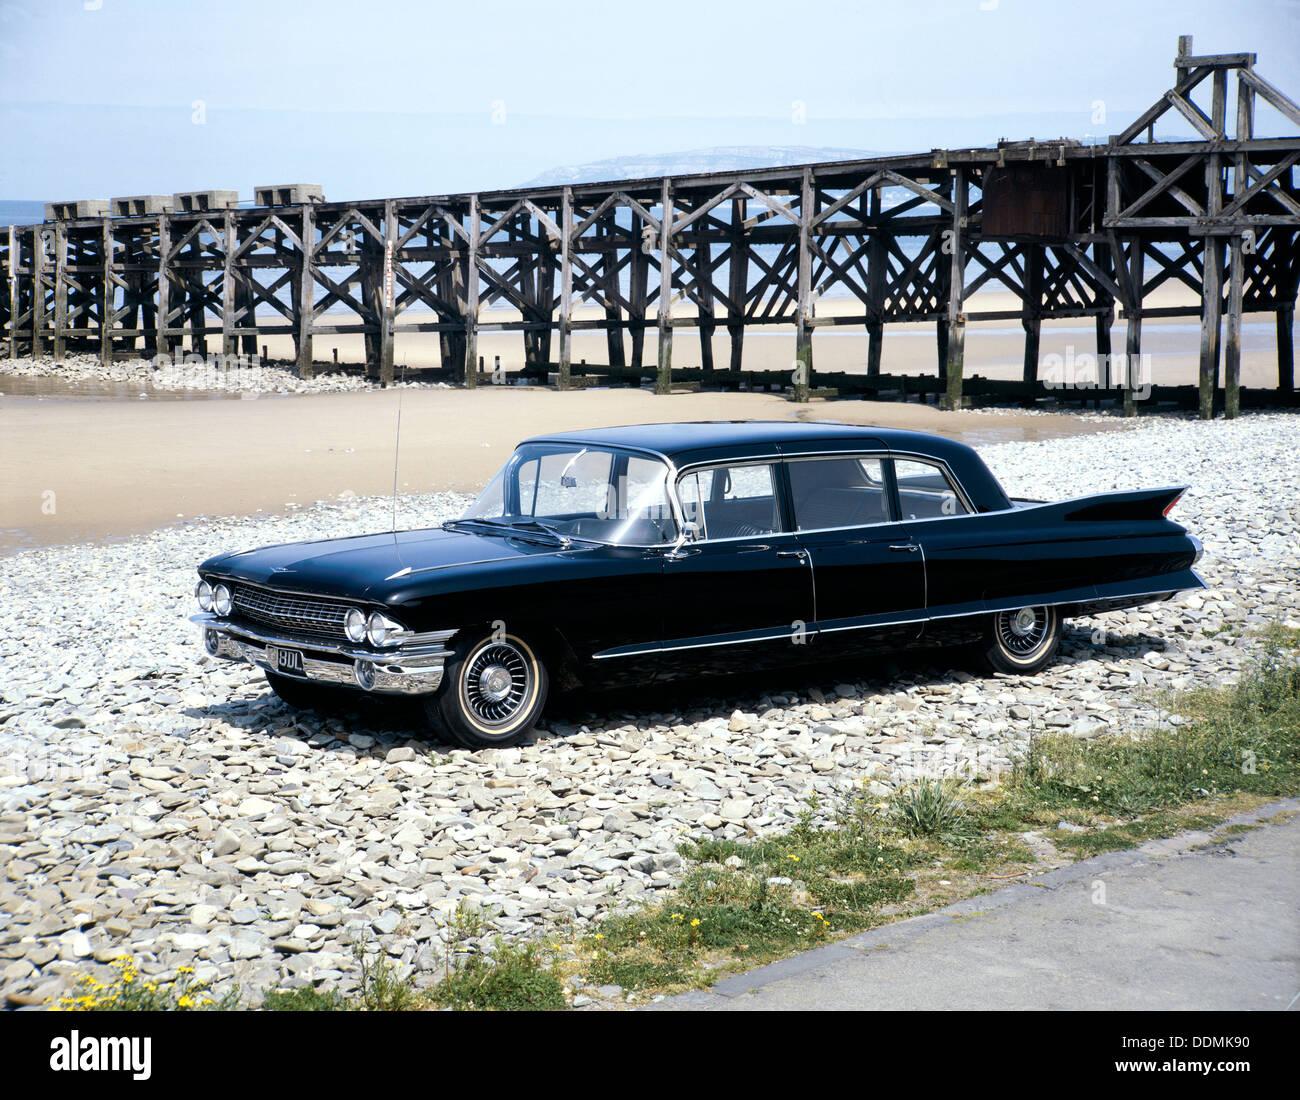 Presidential Car Museum Stock Photos & Presidential Car